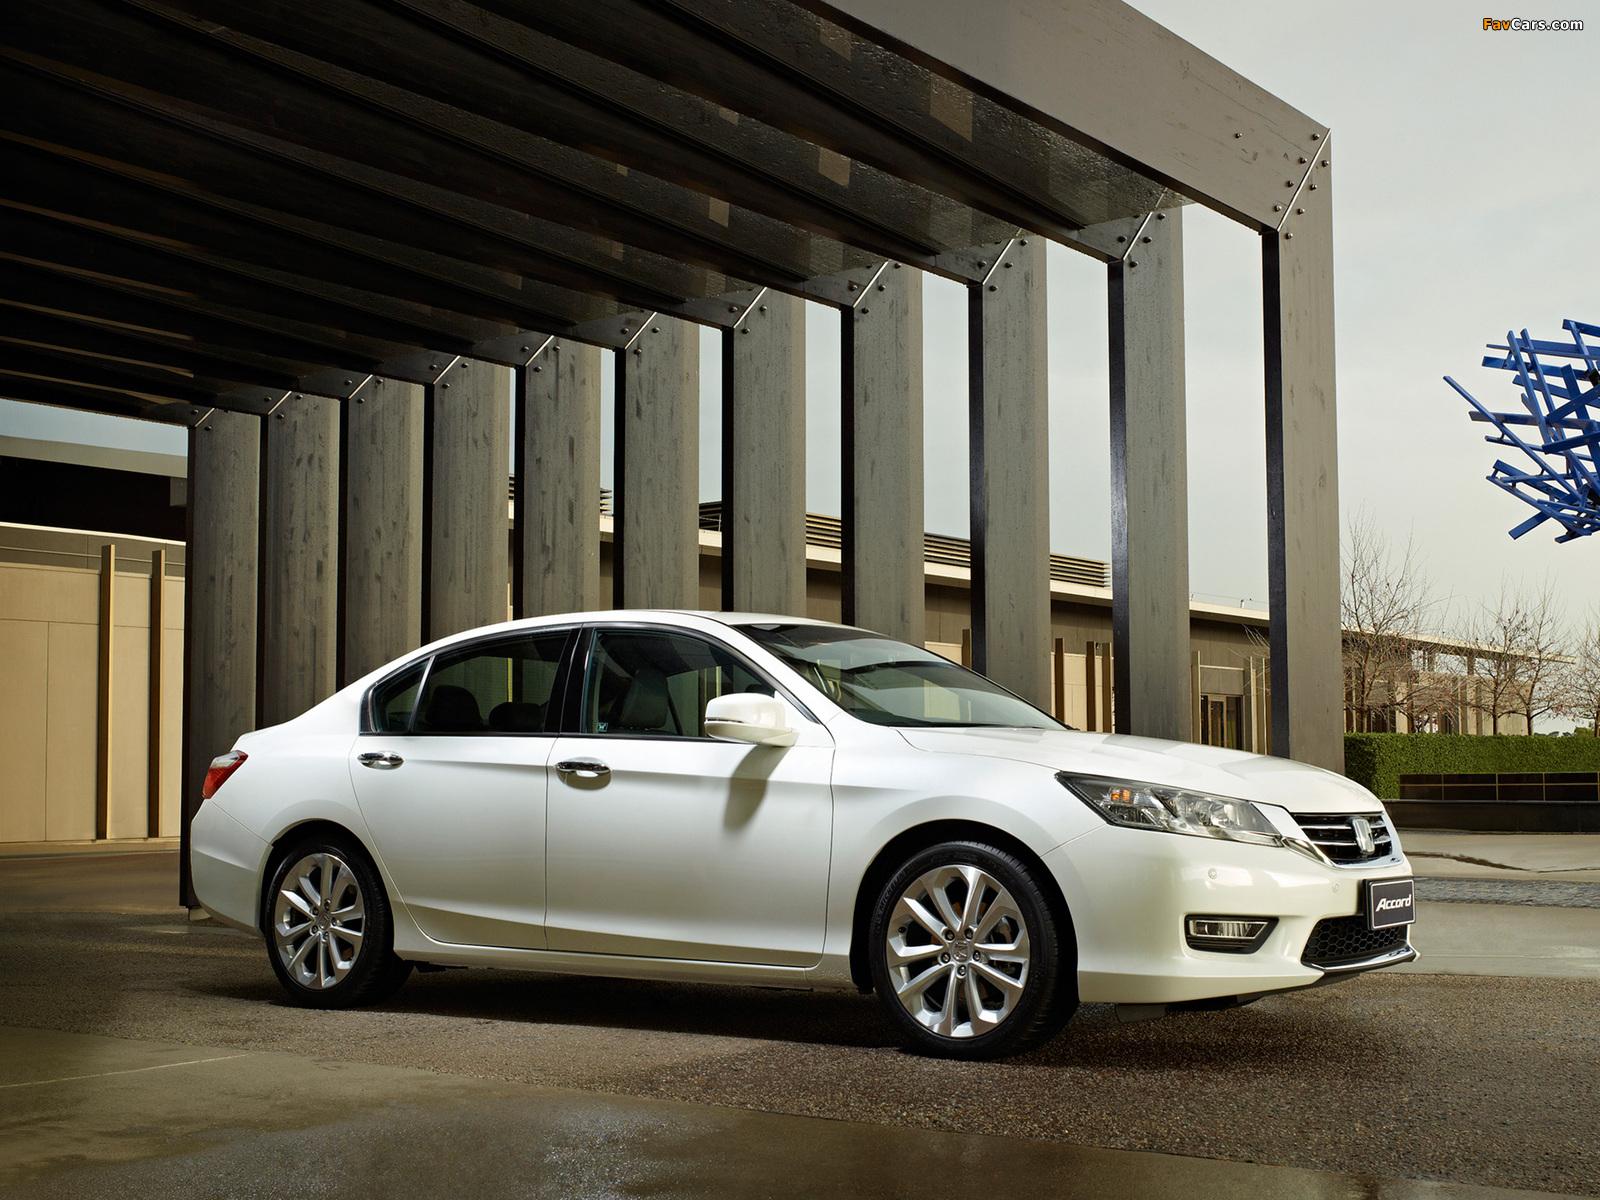 carsedan vehicles for title qatar sale sedan accord honda living